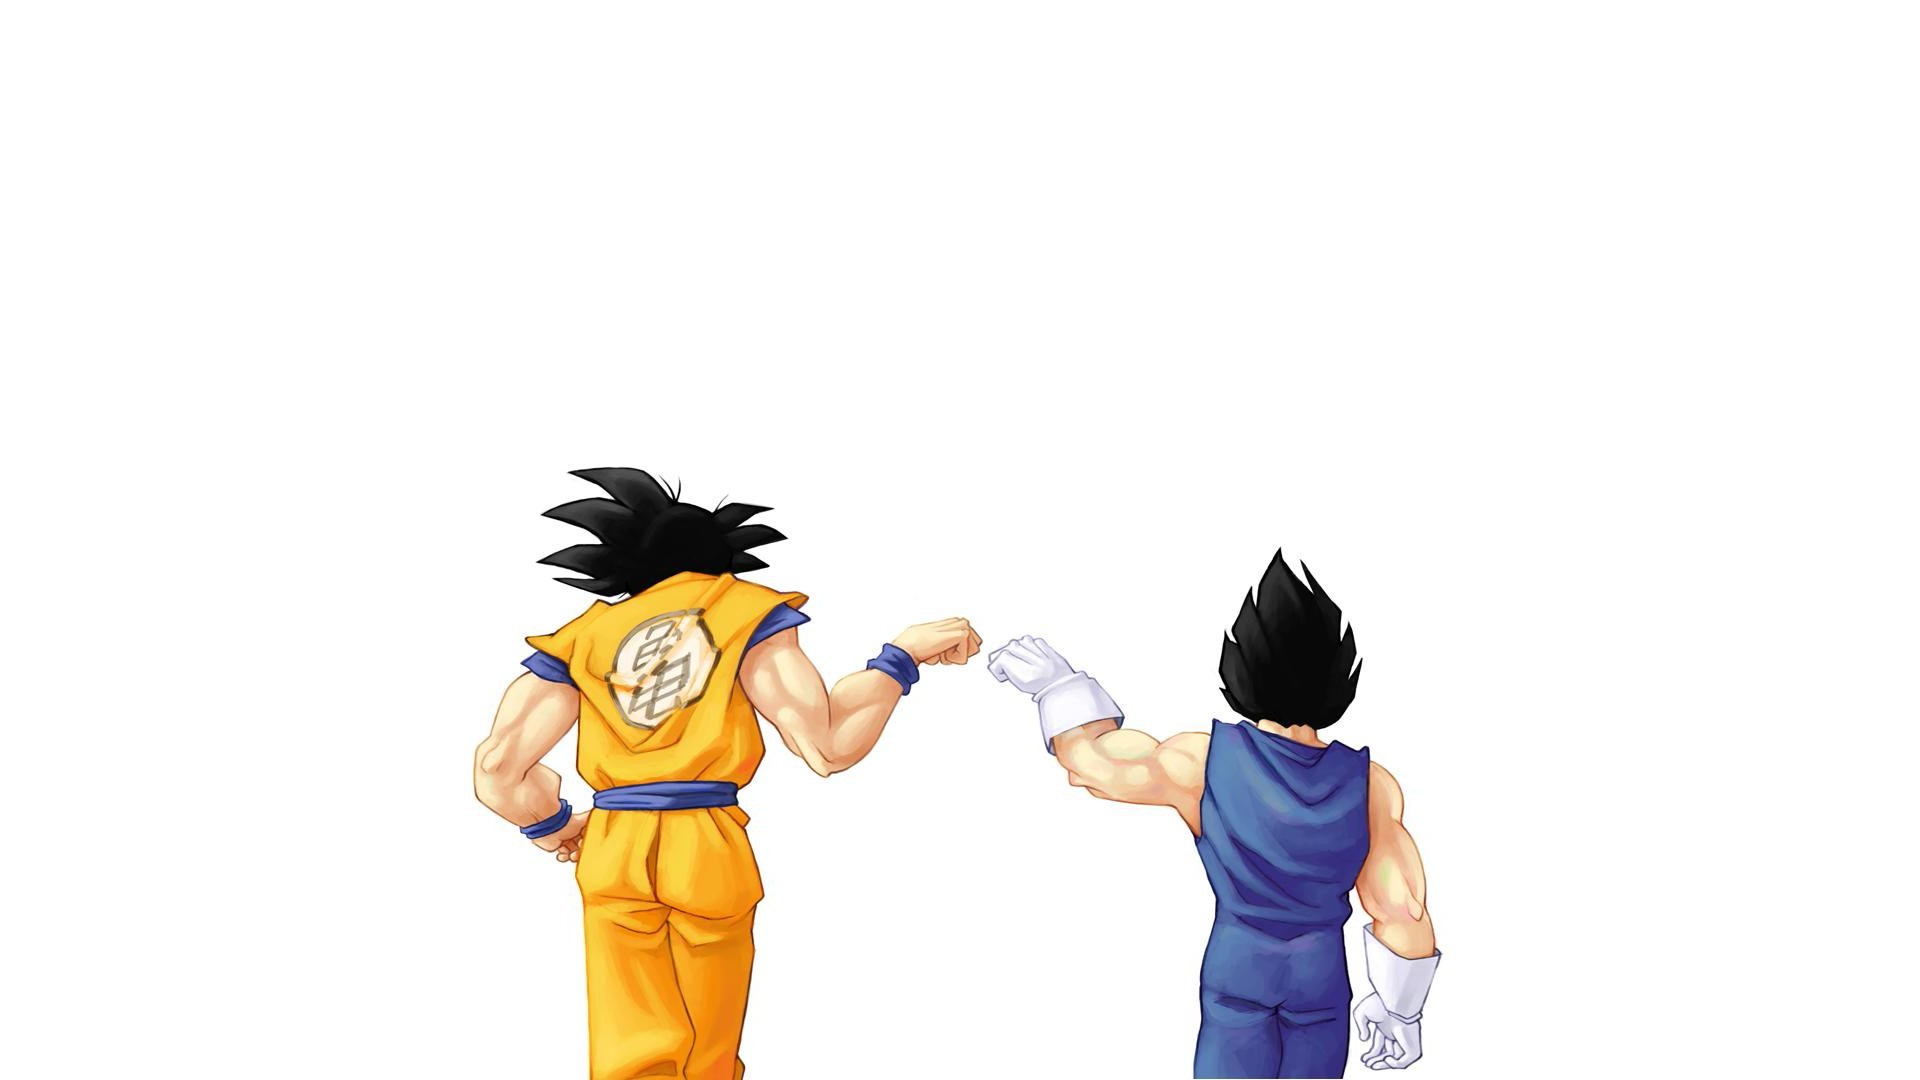 Anime Son Goku Vegeta behind Dragon Ball Z anime